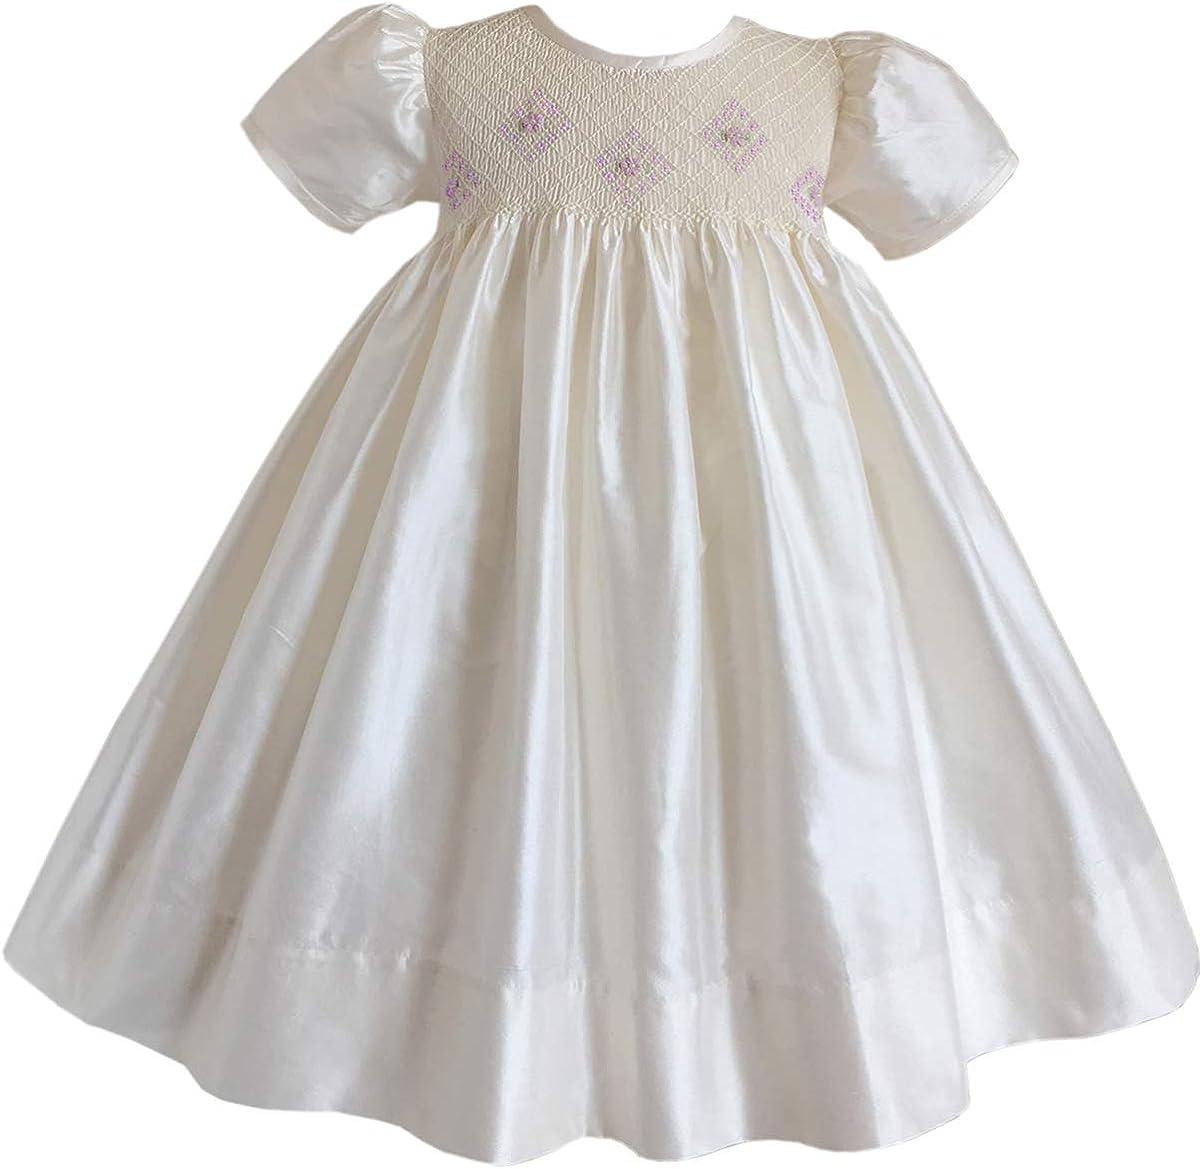 Smocked First Communion Dresses Flower Girls Silk Dress Ivory Smocking